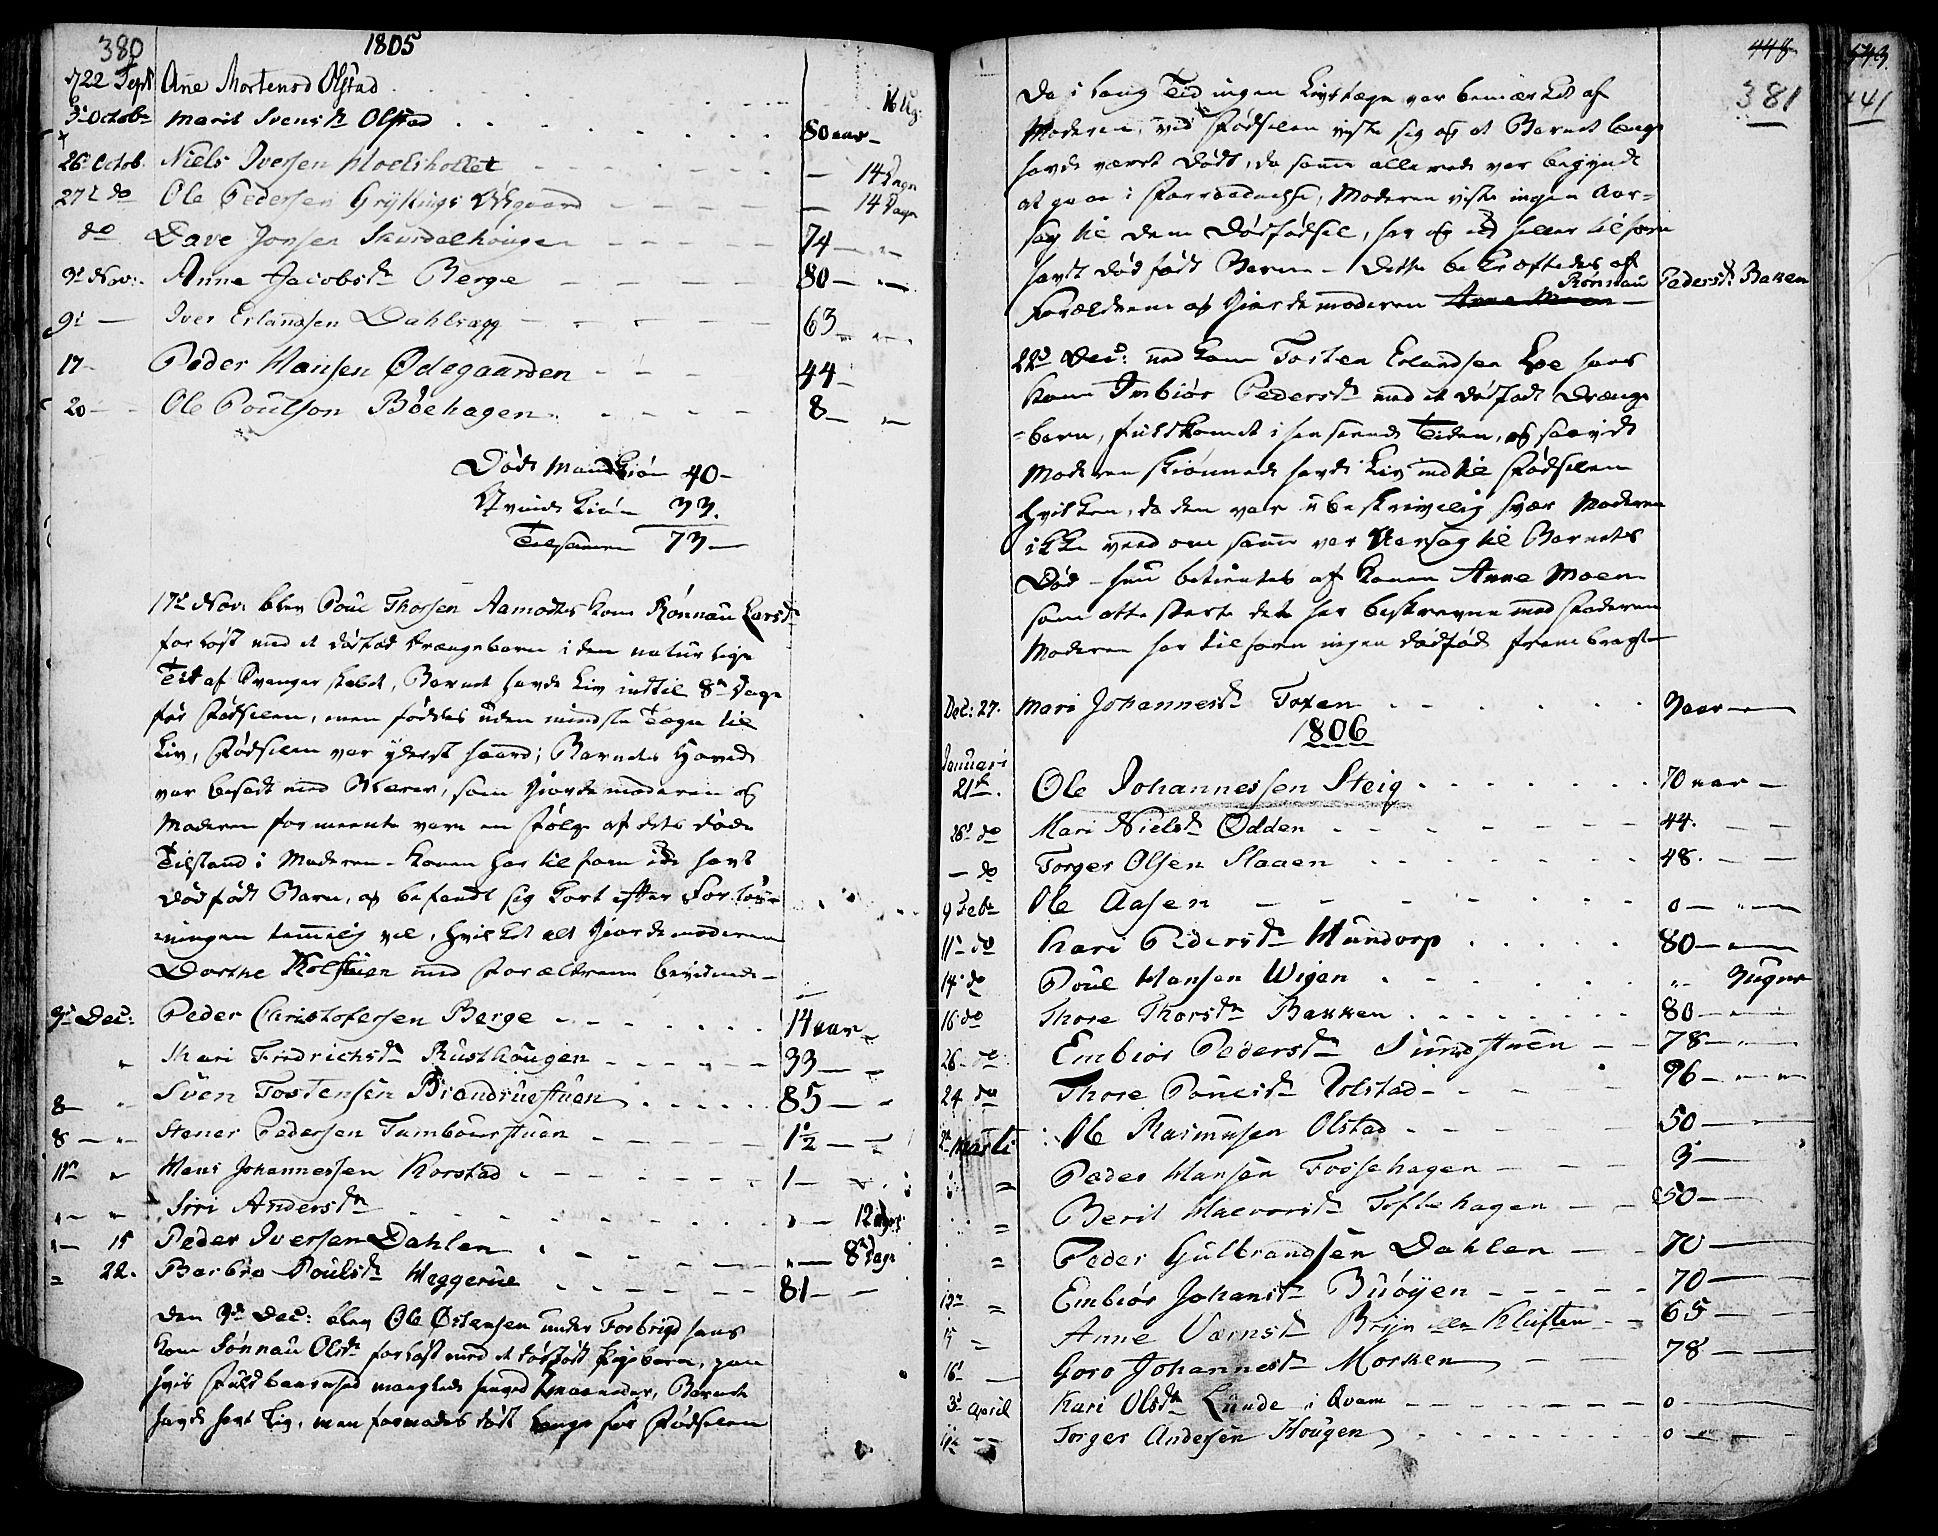 SAH, Fron prestekontor, H/Ha/Haa/L0001: Ministerialbok nr. 1, 1799-1816, s. 380-381